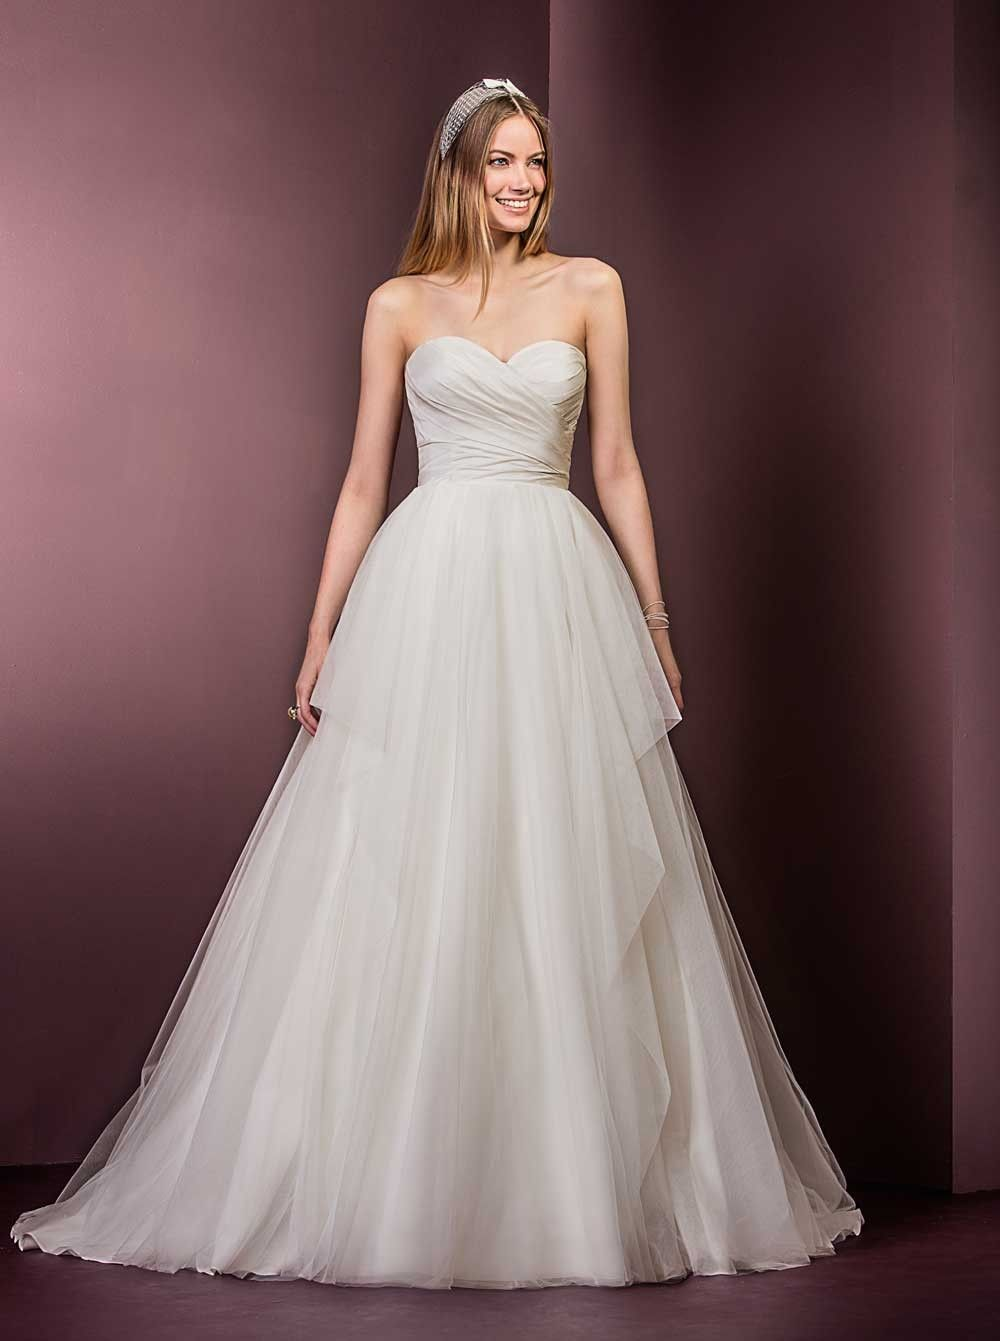 Ellis bridals 12252 wedding dress krystle brides a